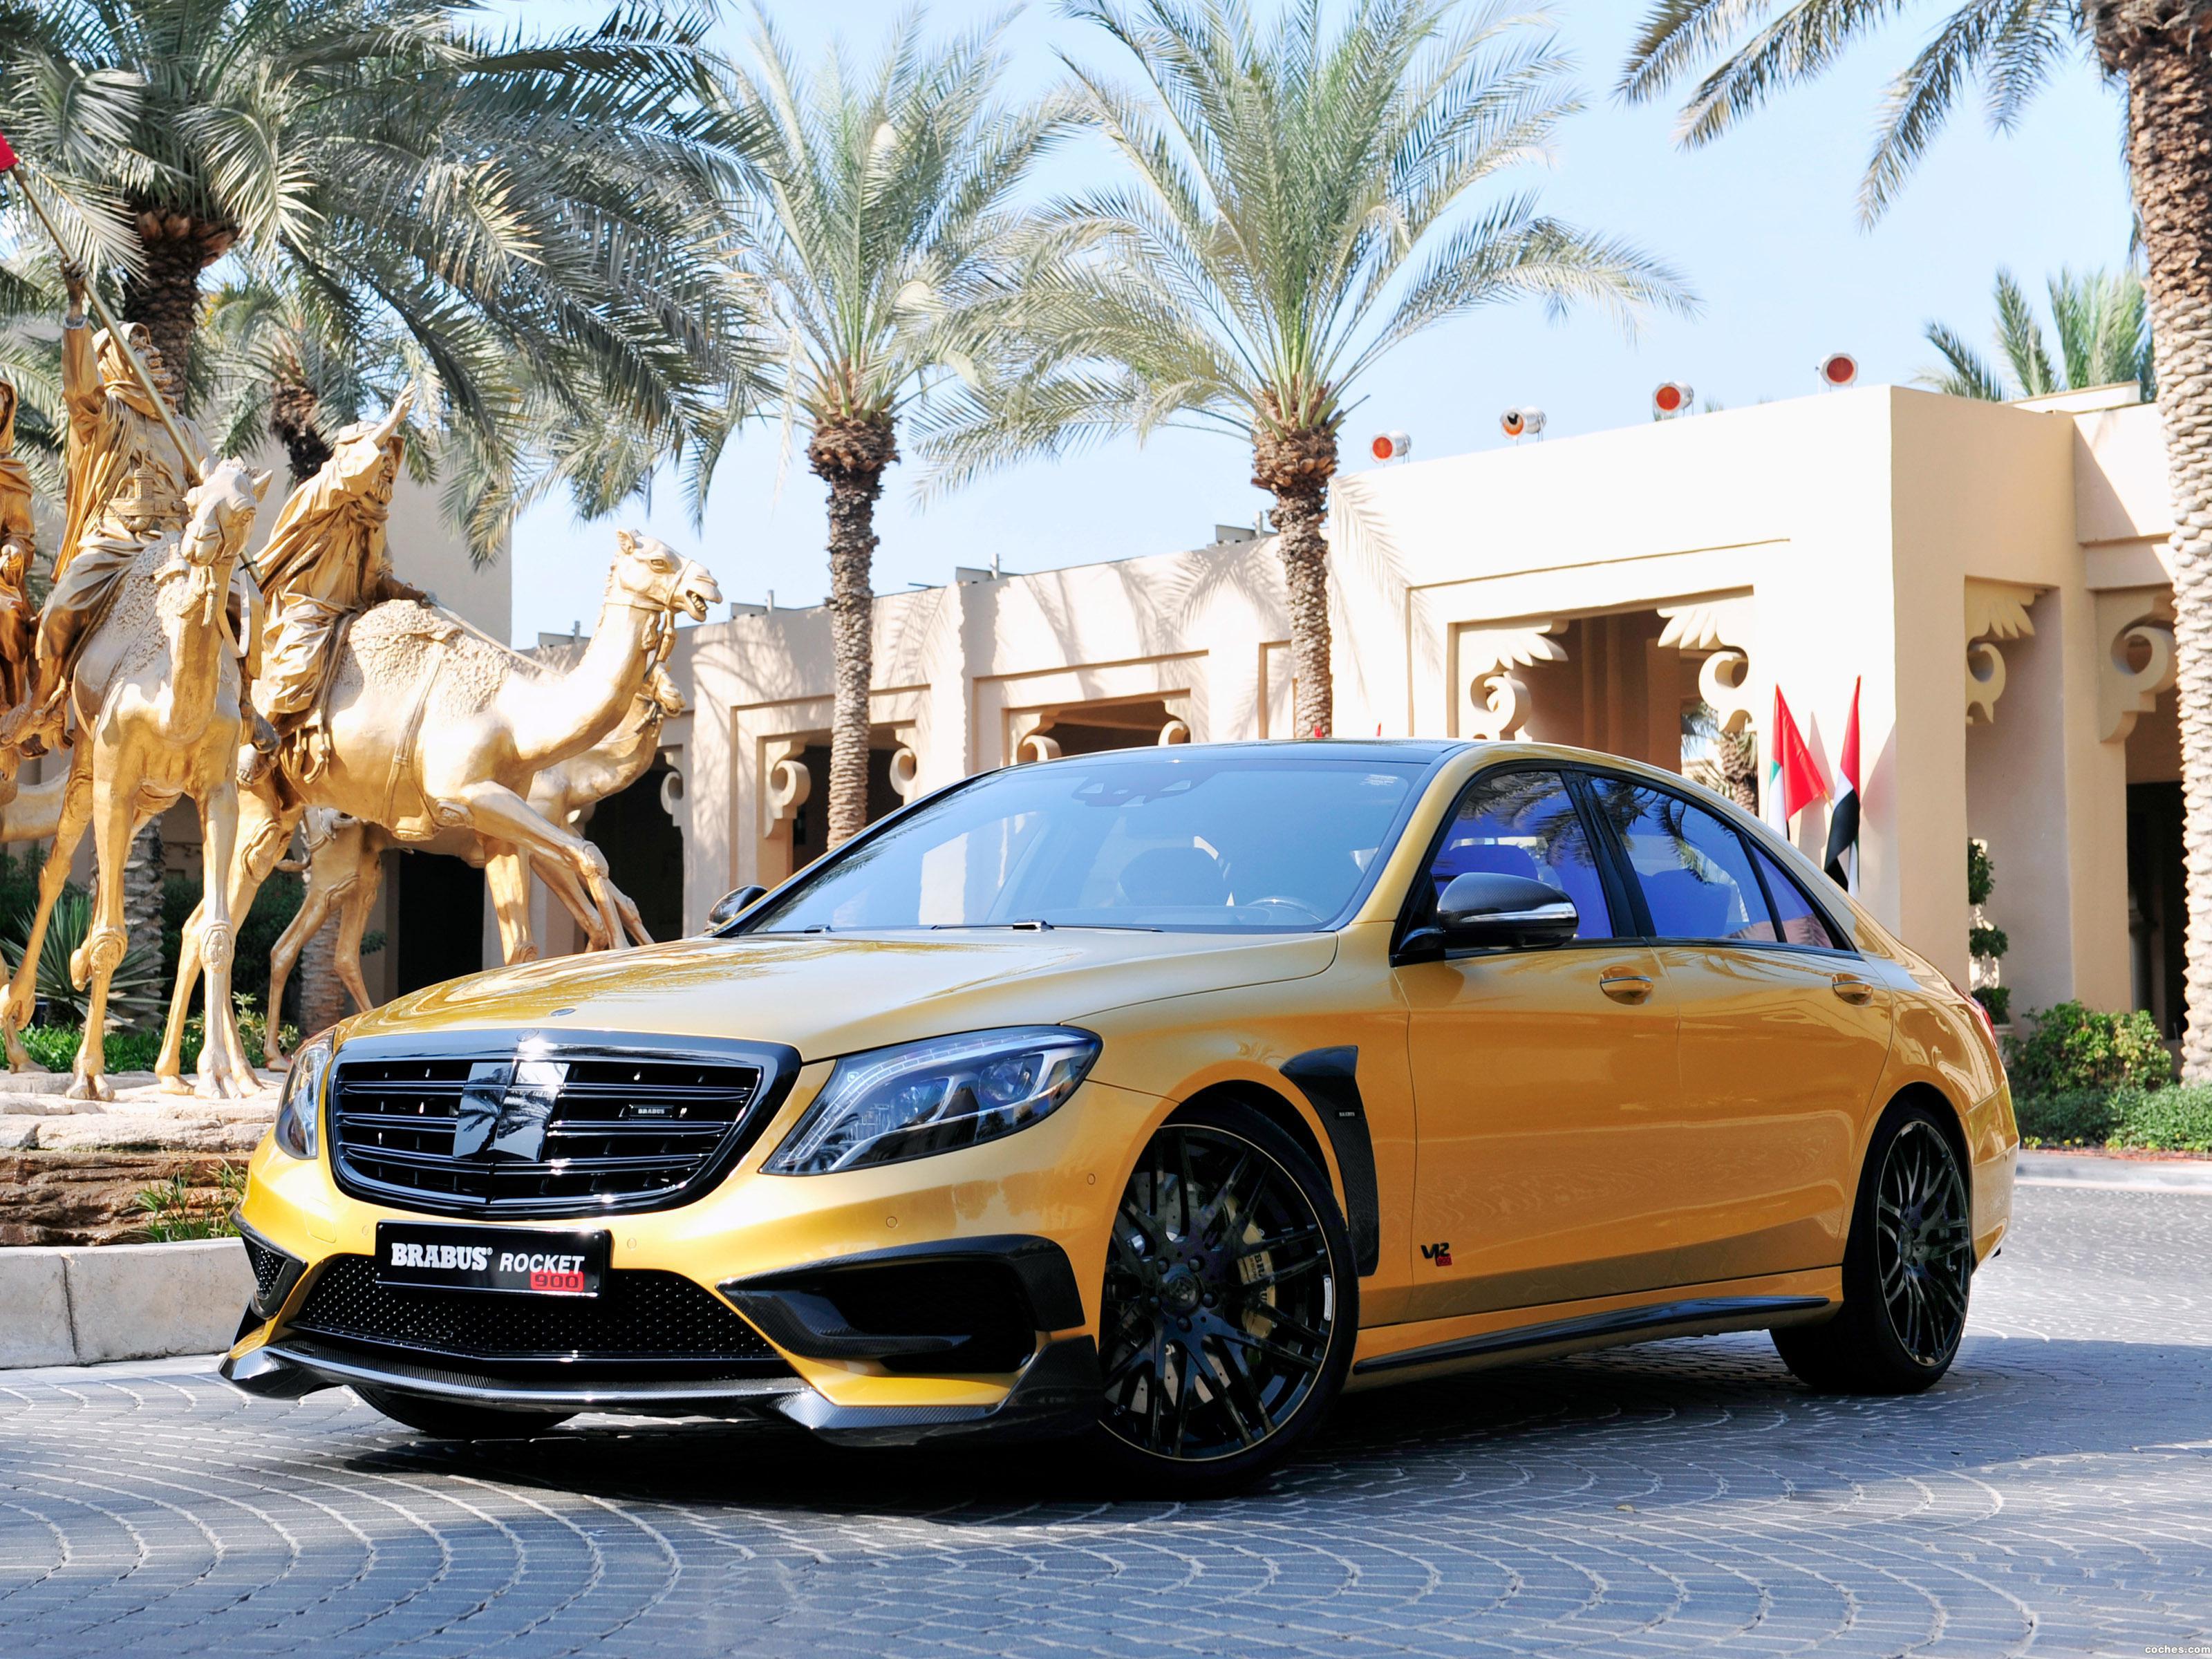 Foto 0 de Brabus Mercedes Clase S Rocket 900 Desert Gold Edition W222 2015